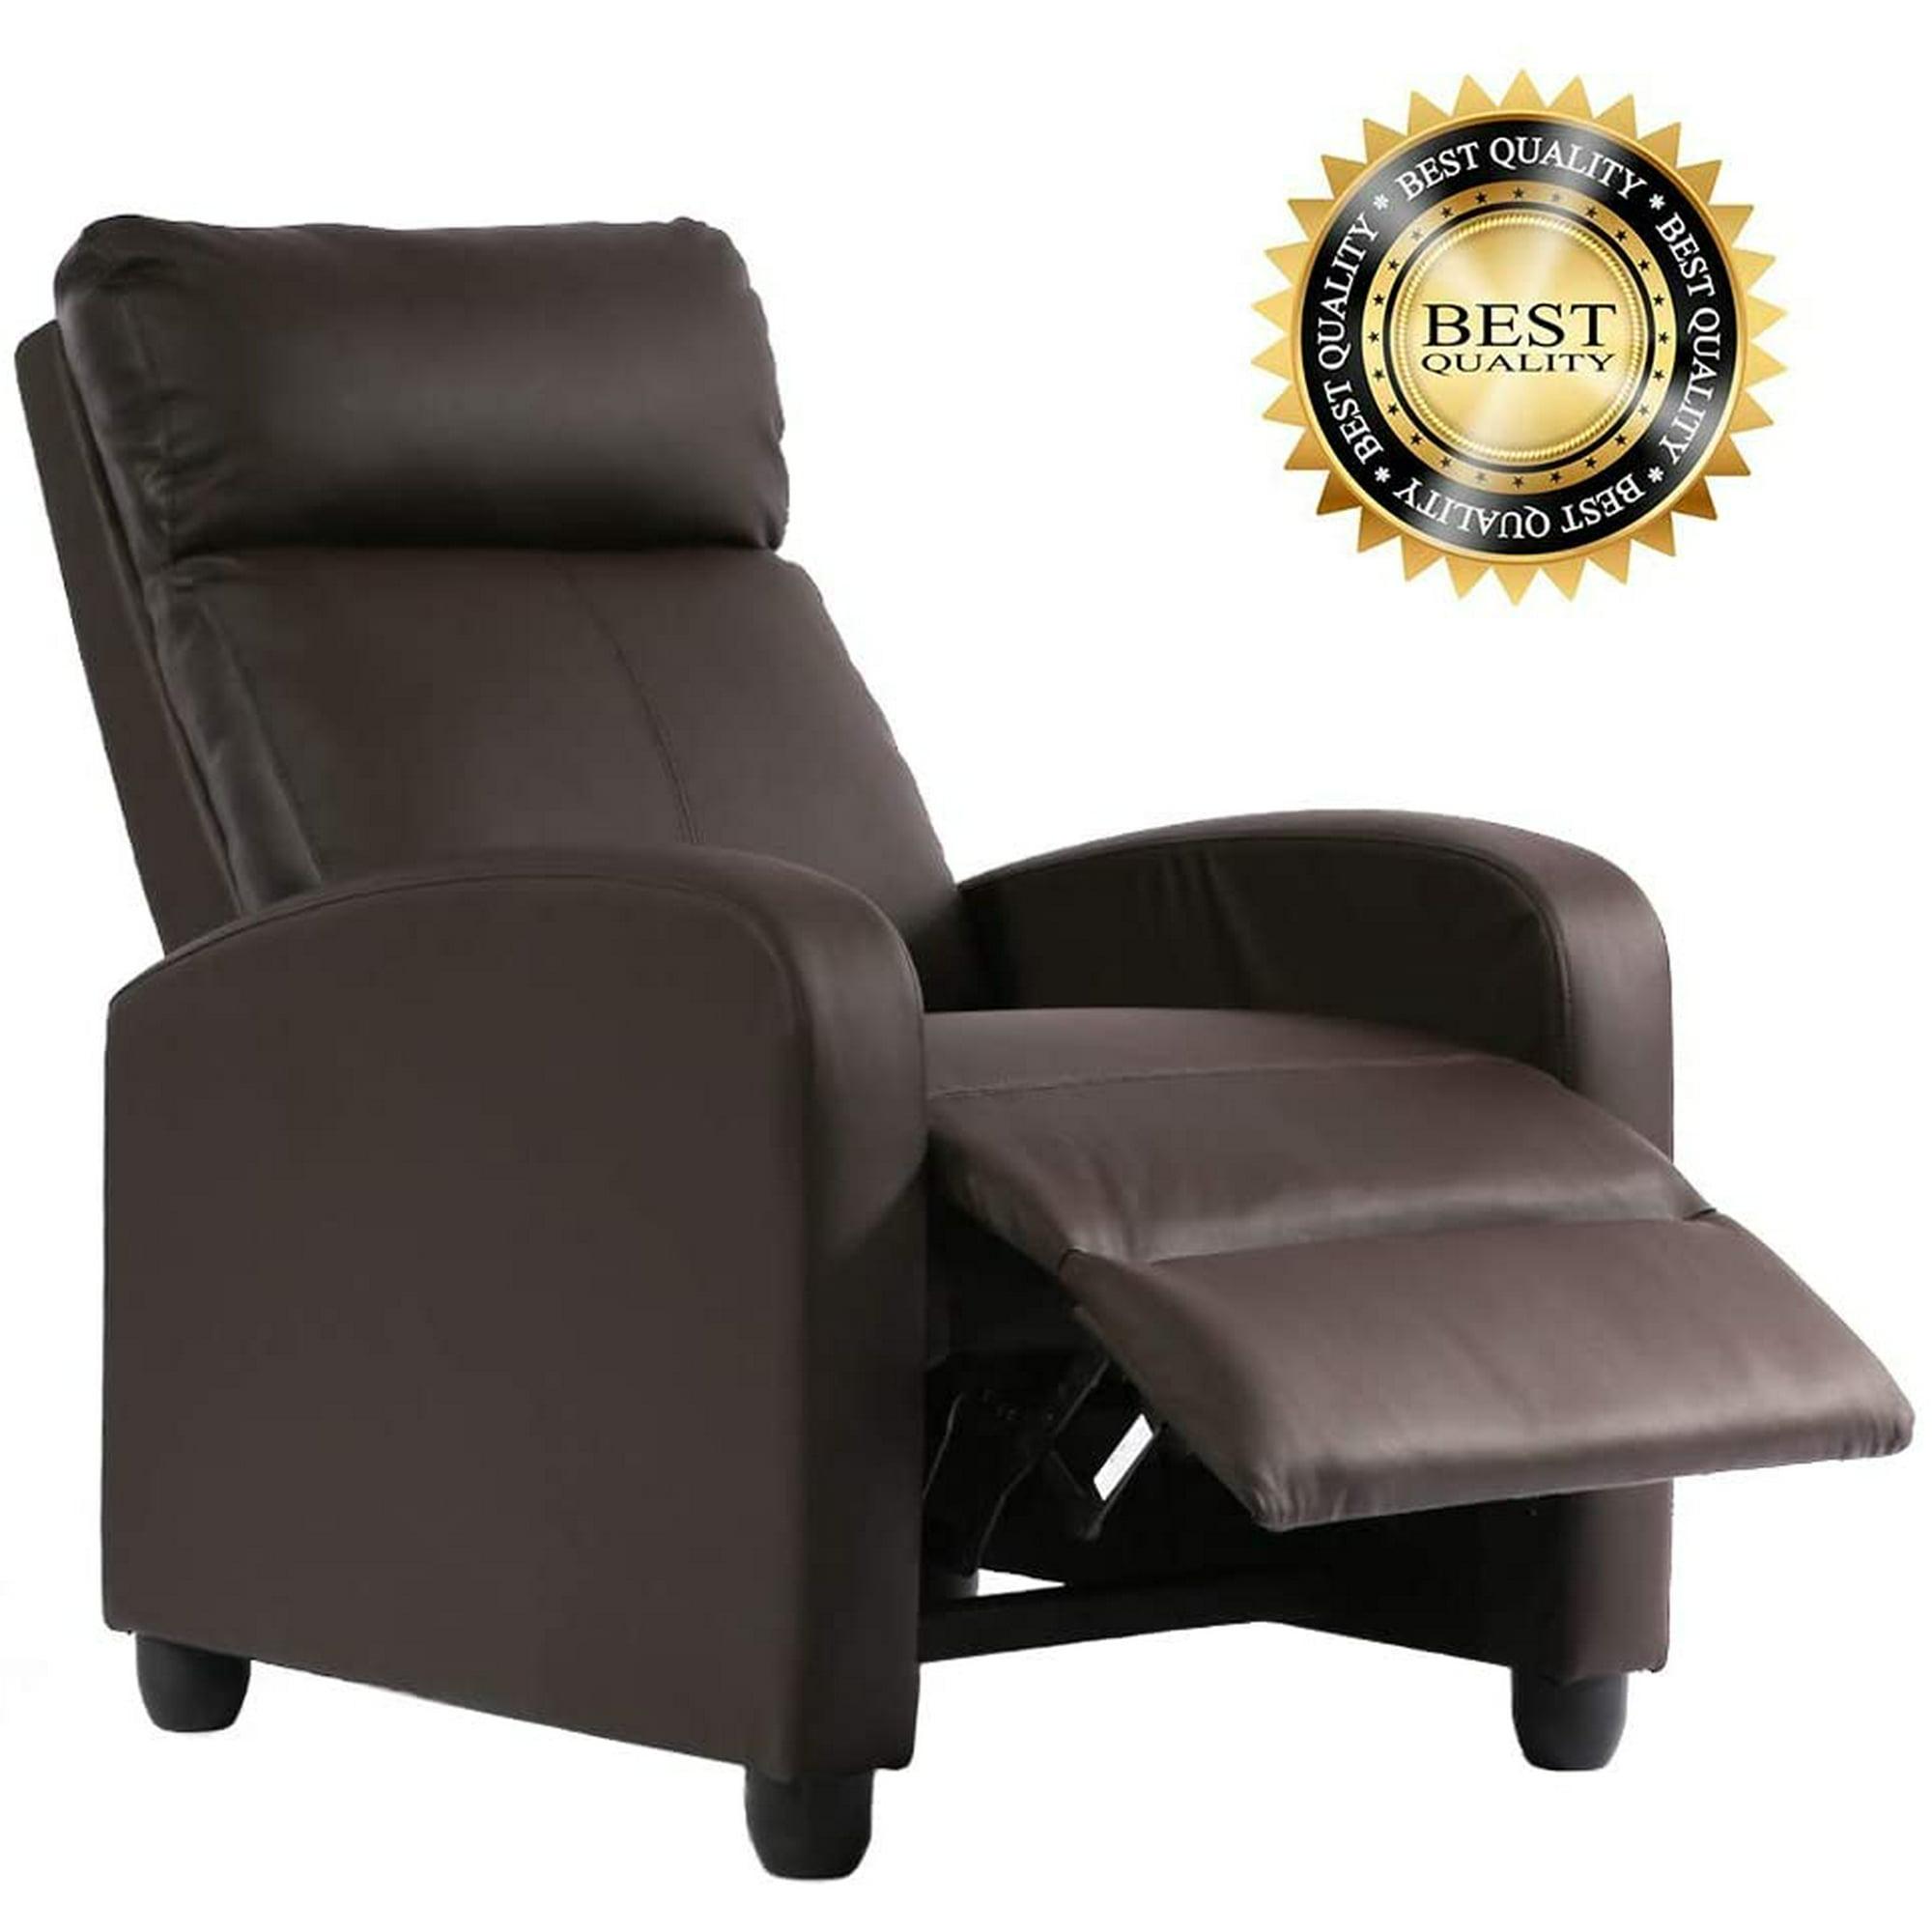 Recliner Sofa Wingback Chair